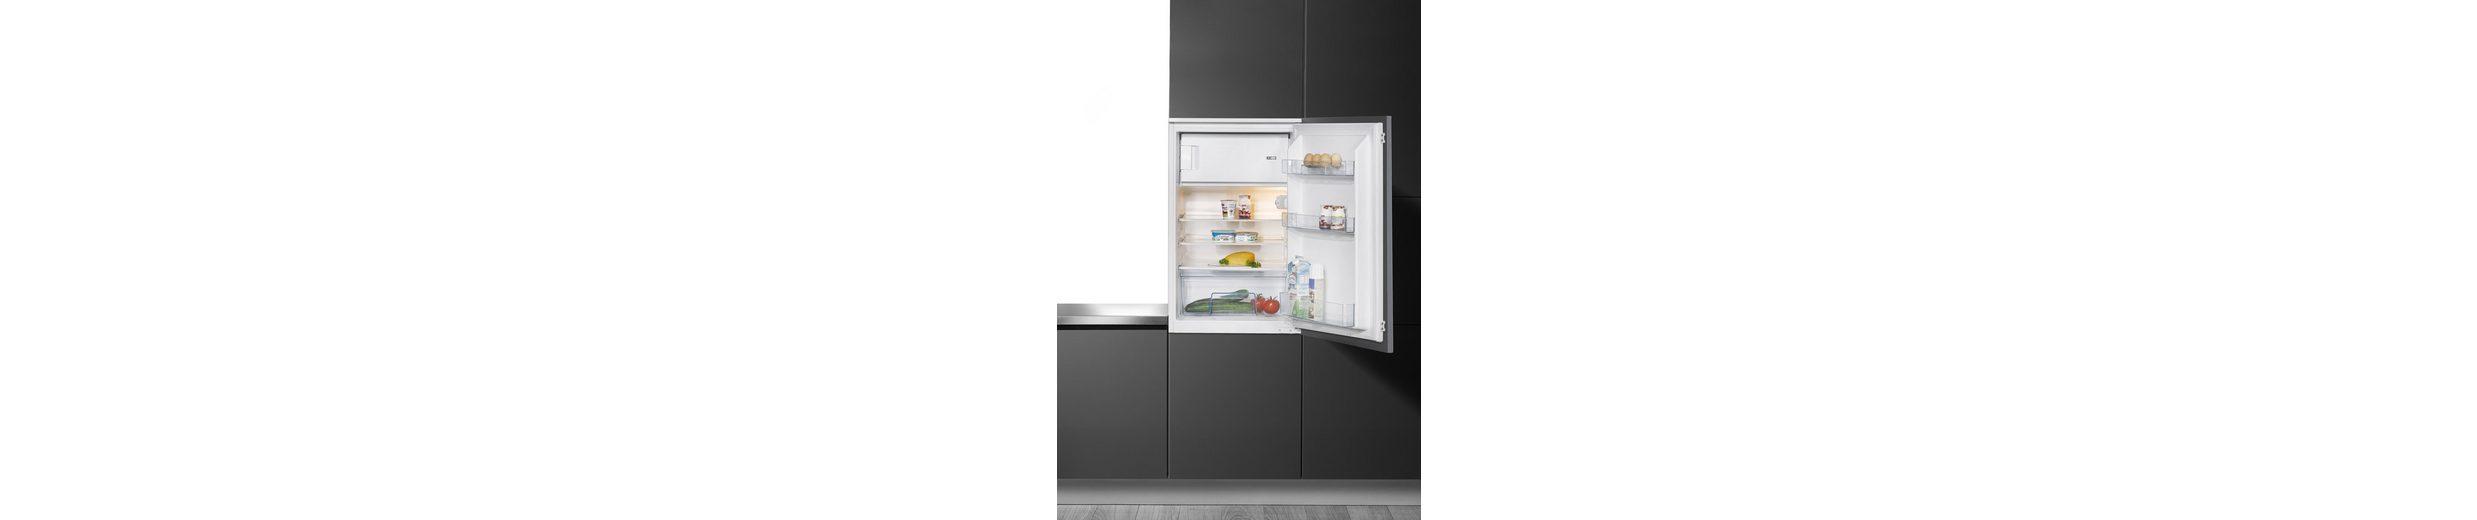 Amica integrierbarer Einbau-Kühlschrank EKS 16161, A+, 88 cm